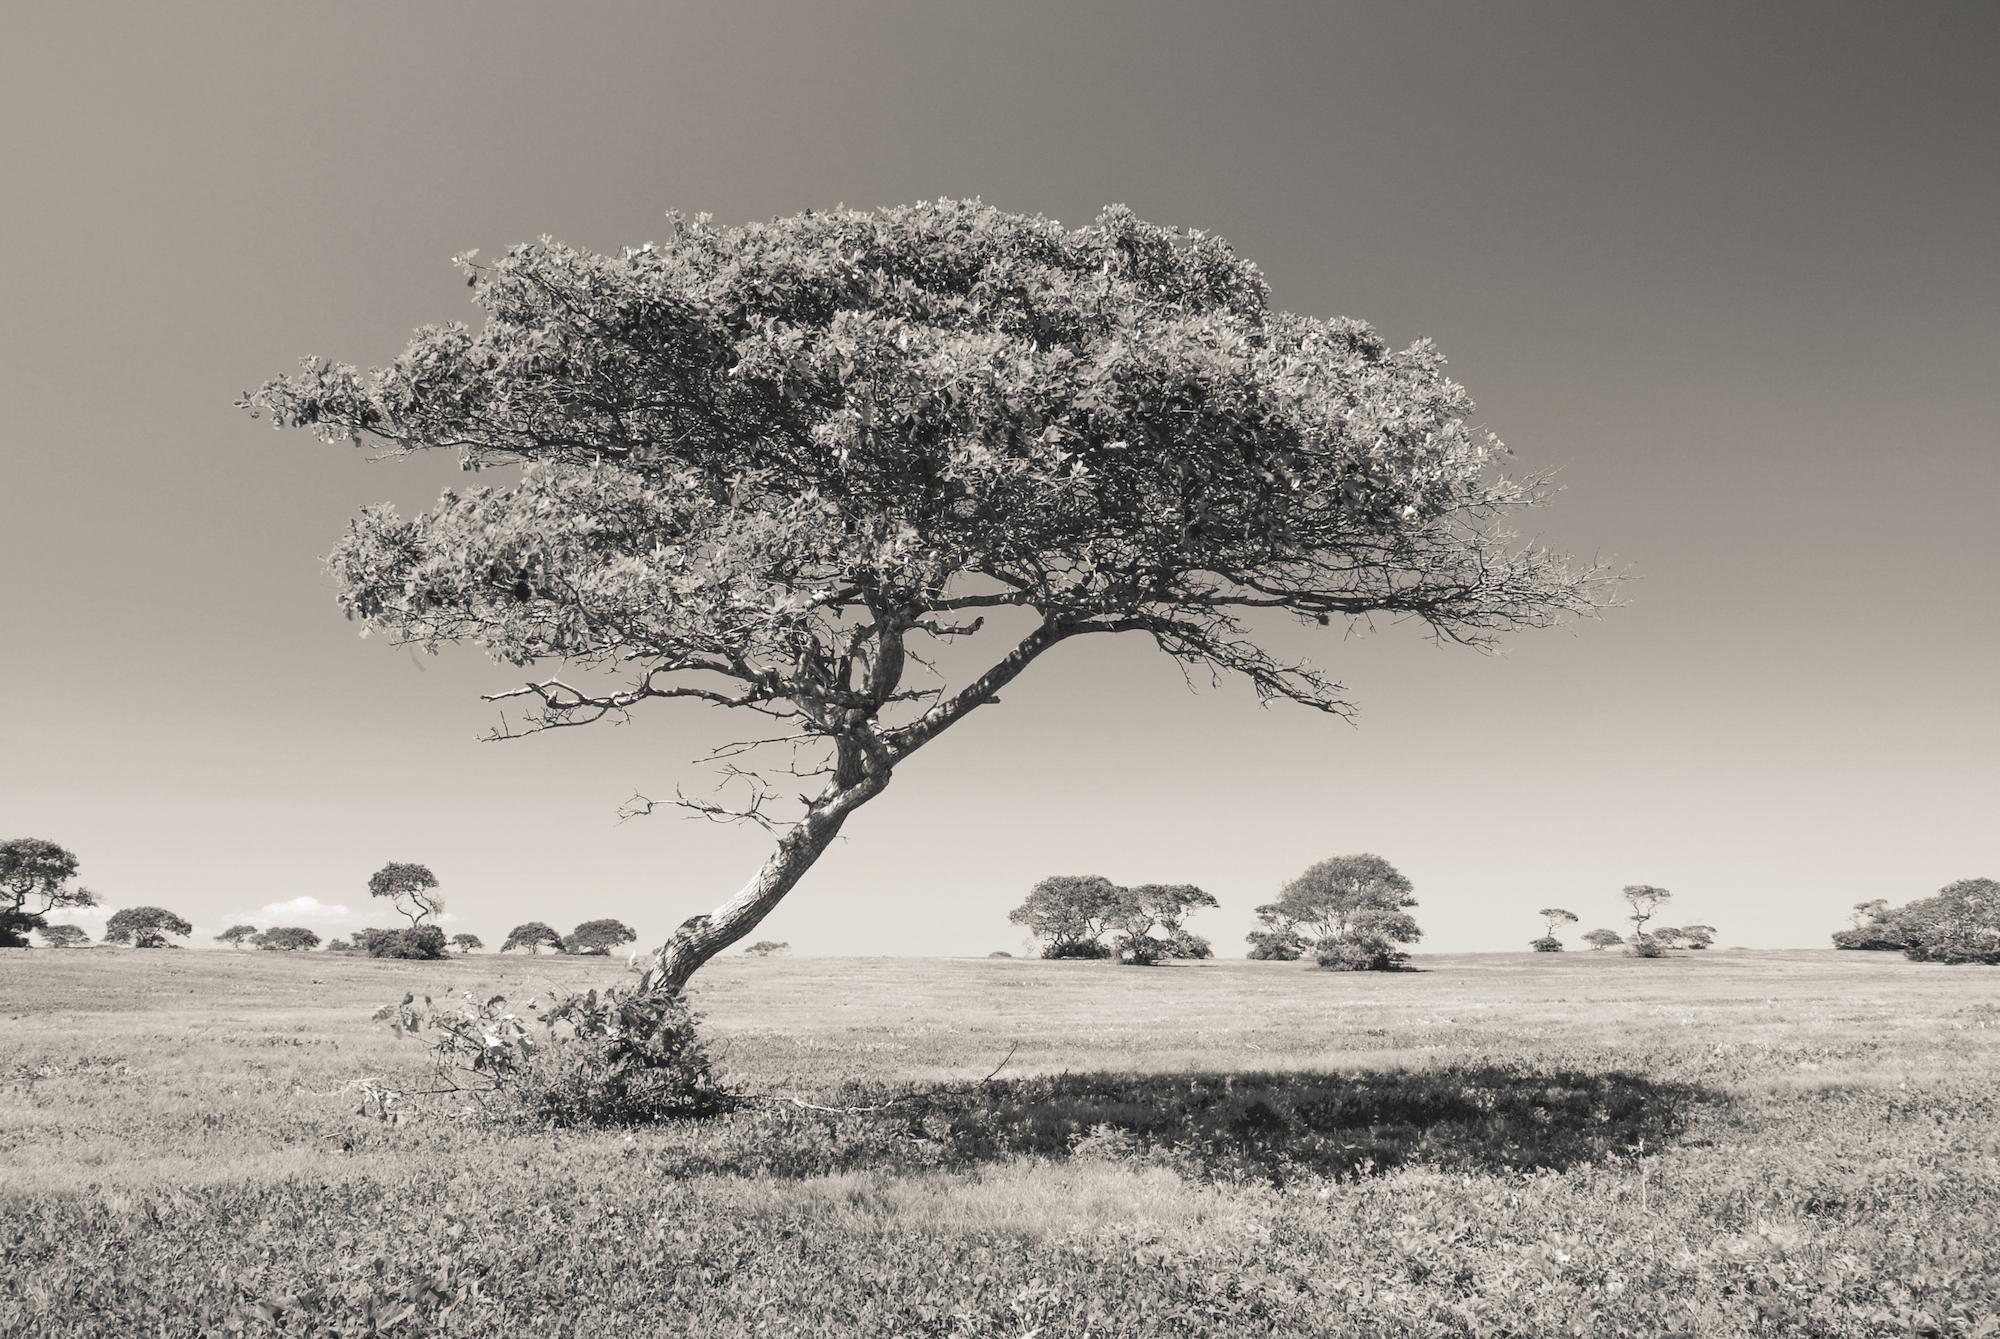 'Serengeti', Nantucket MA